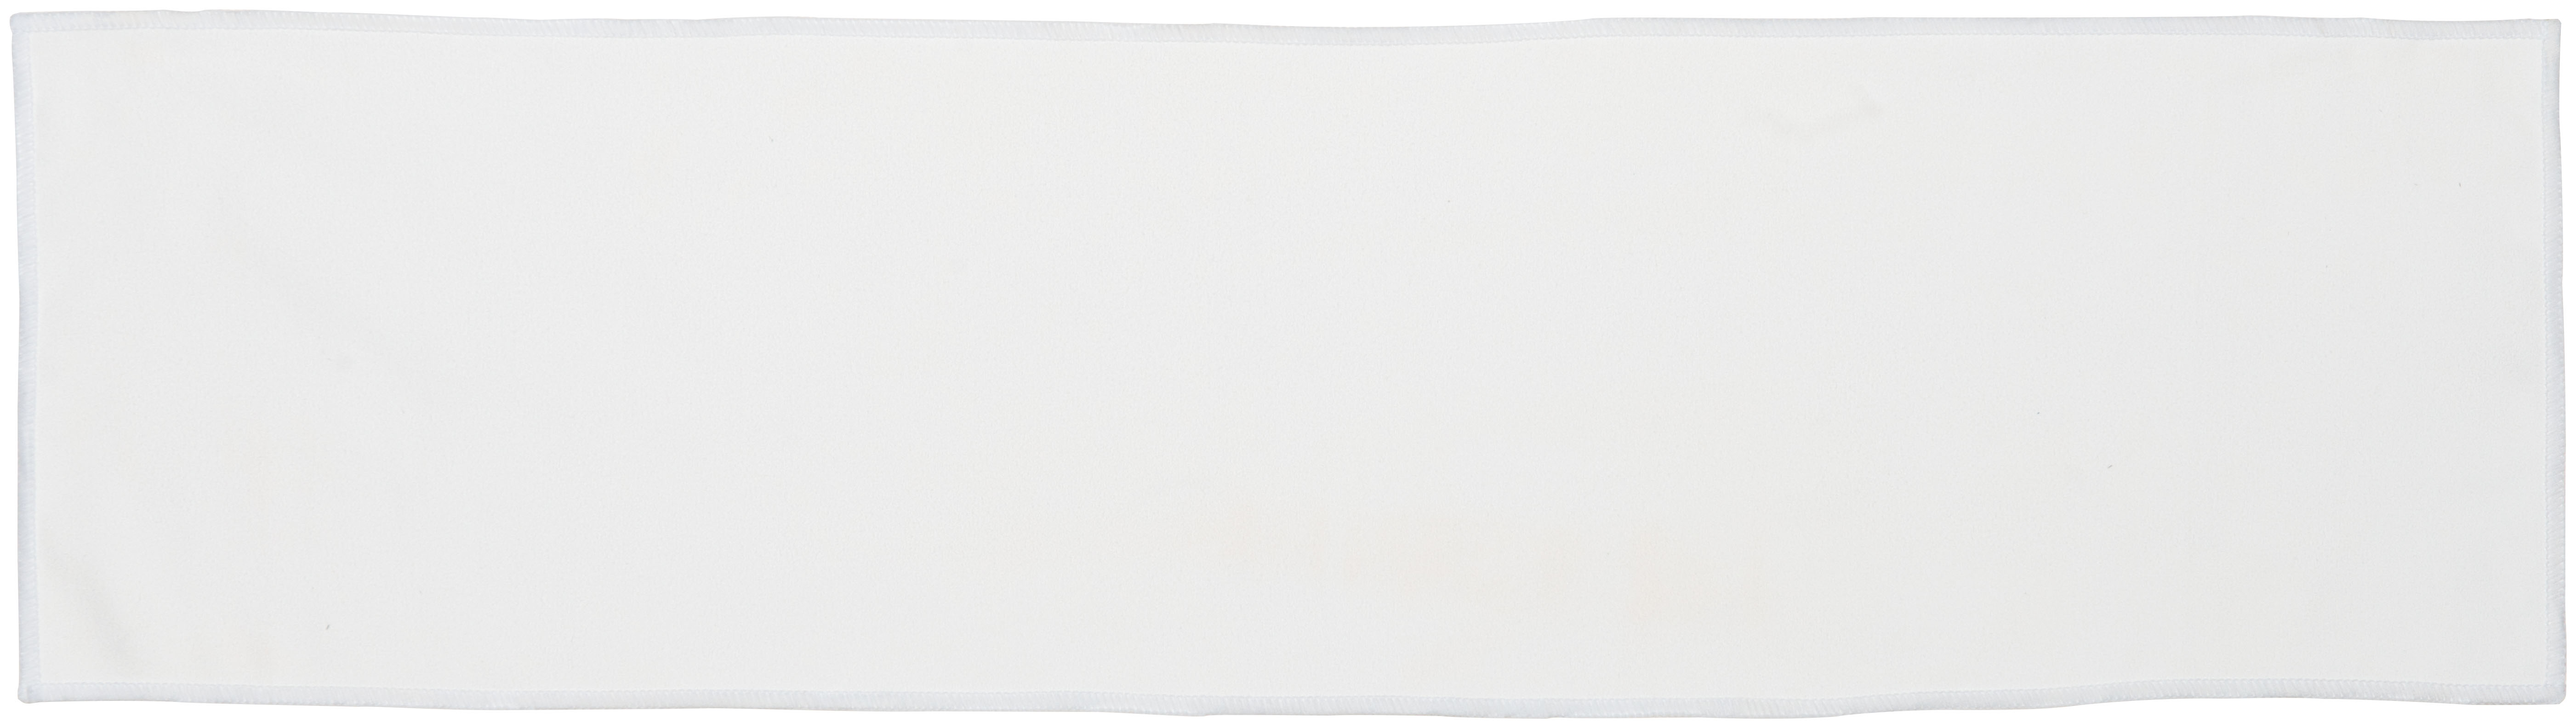 Frigitowel-White-Small-Flat